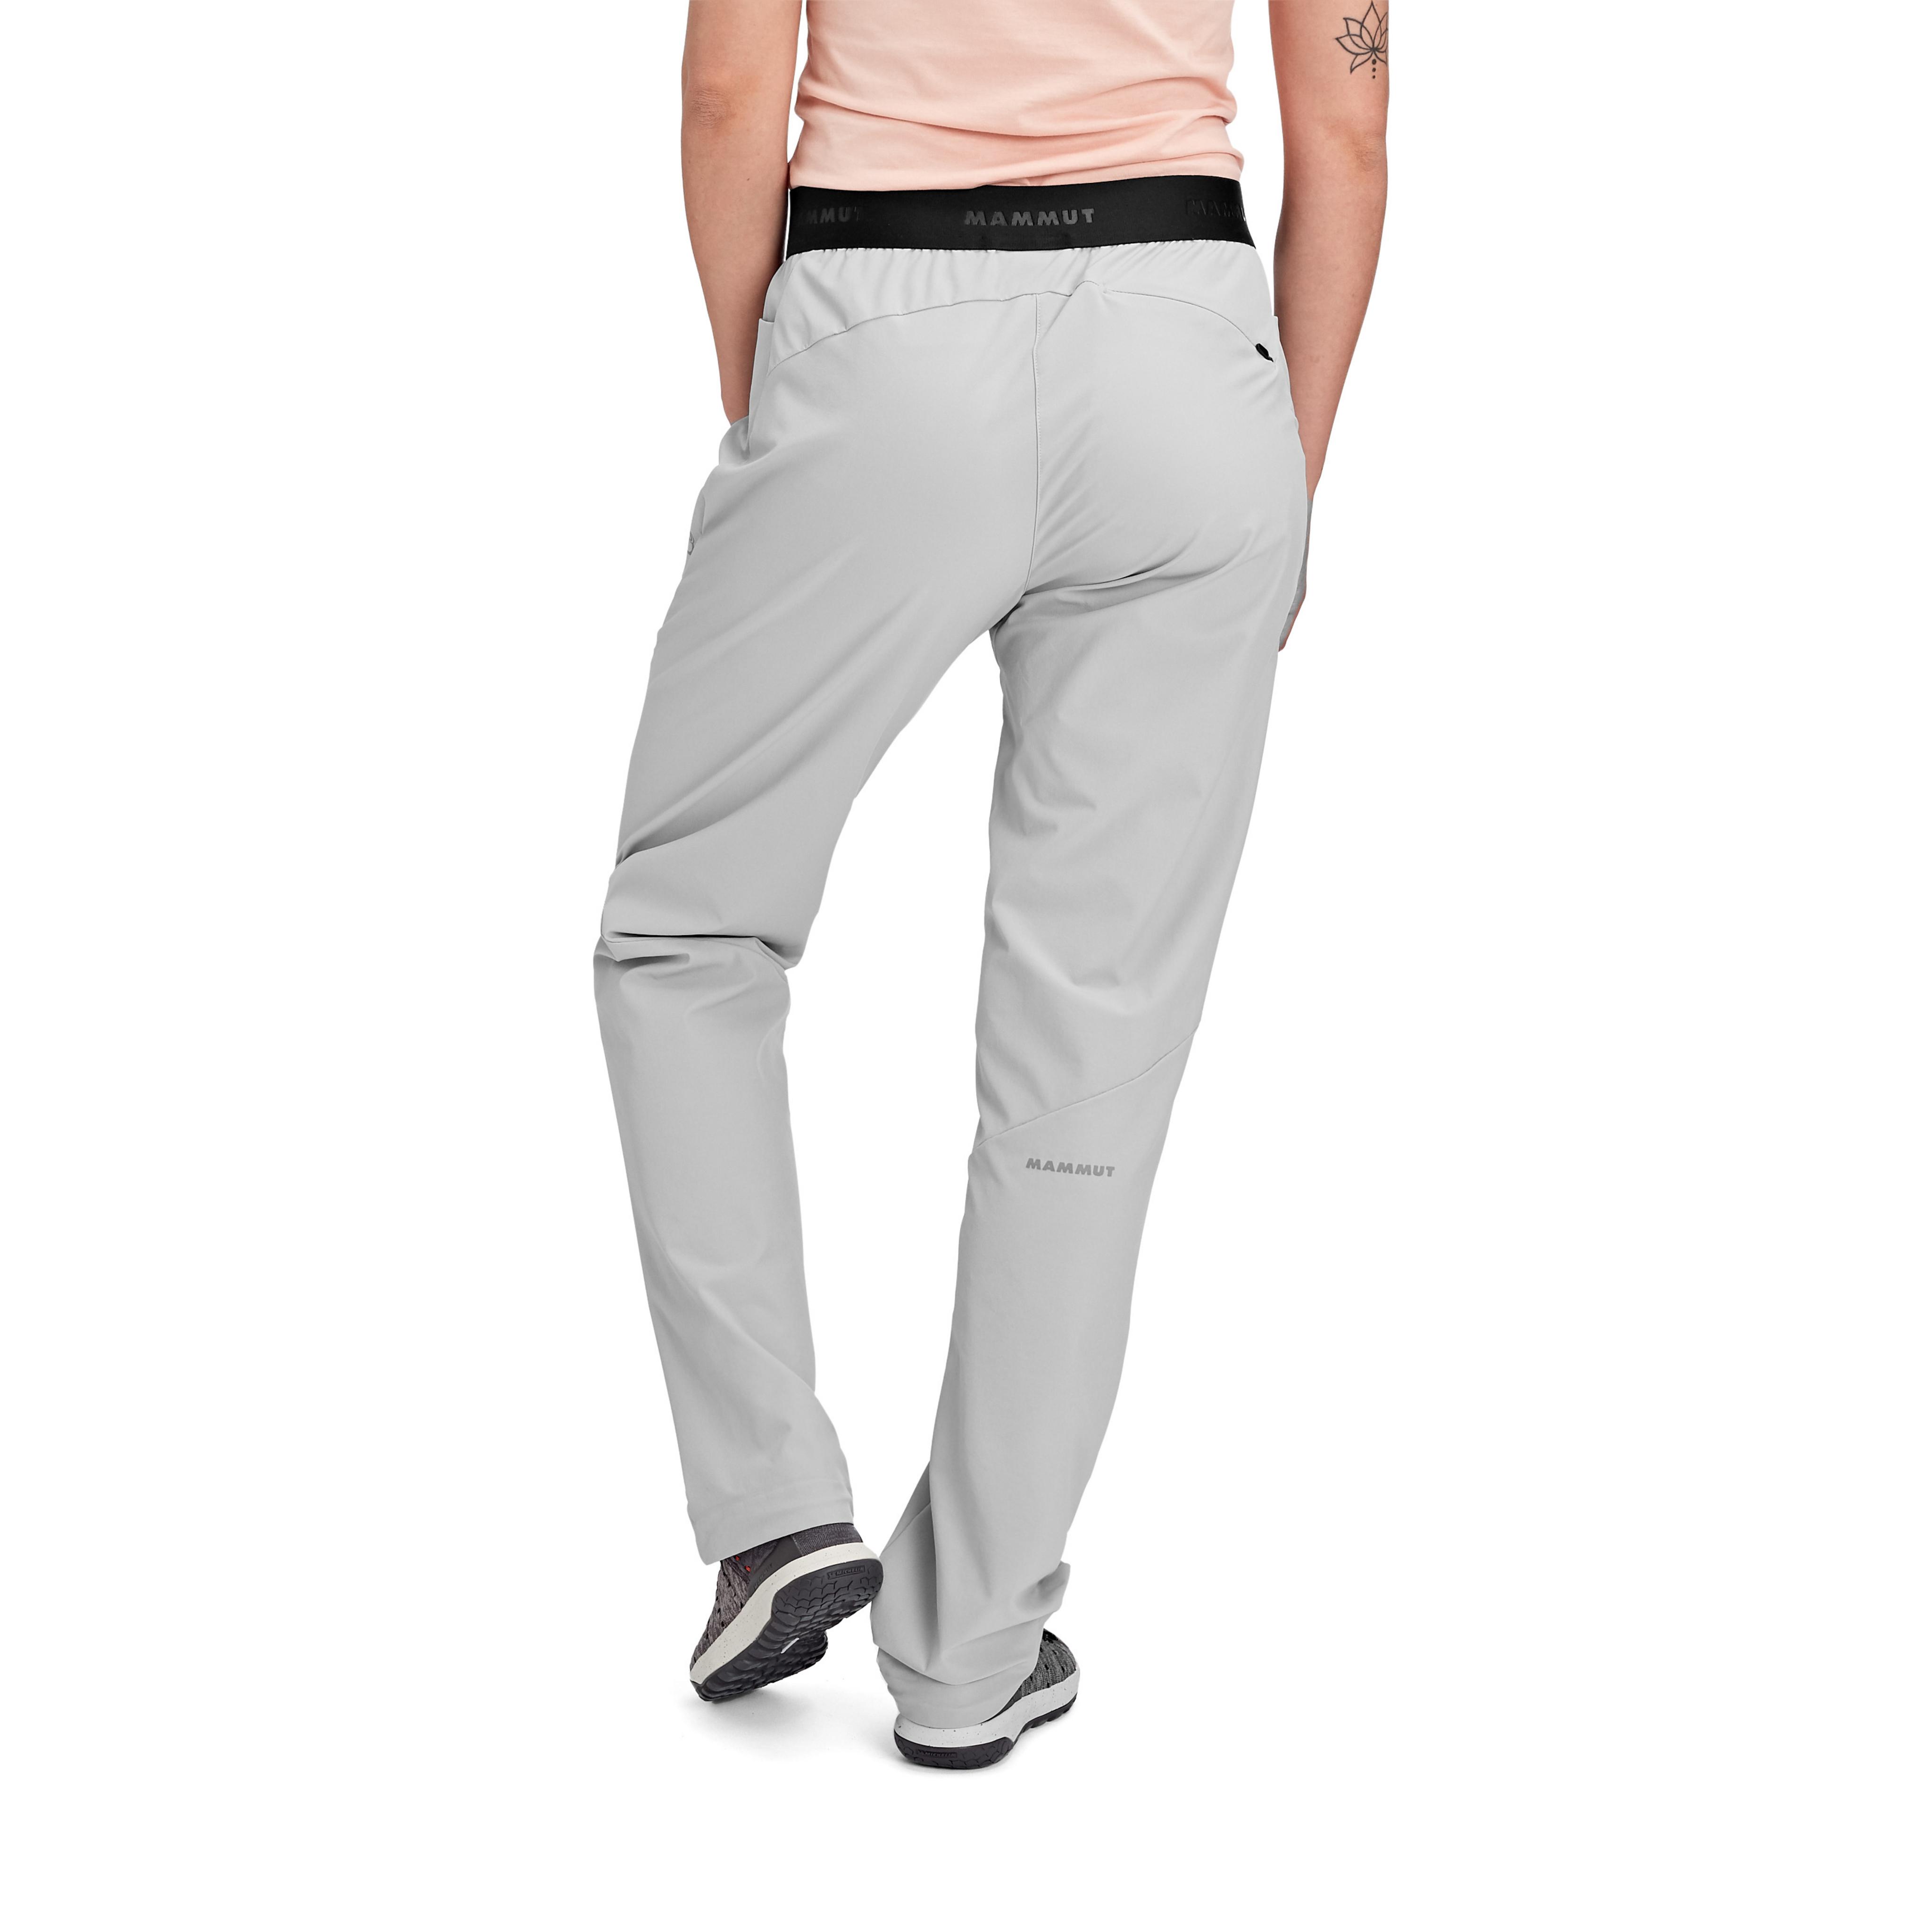 Massone Pants Women product image